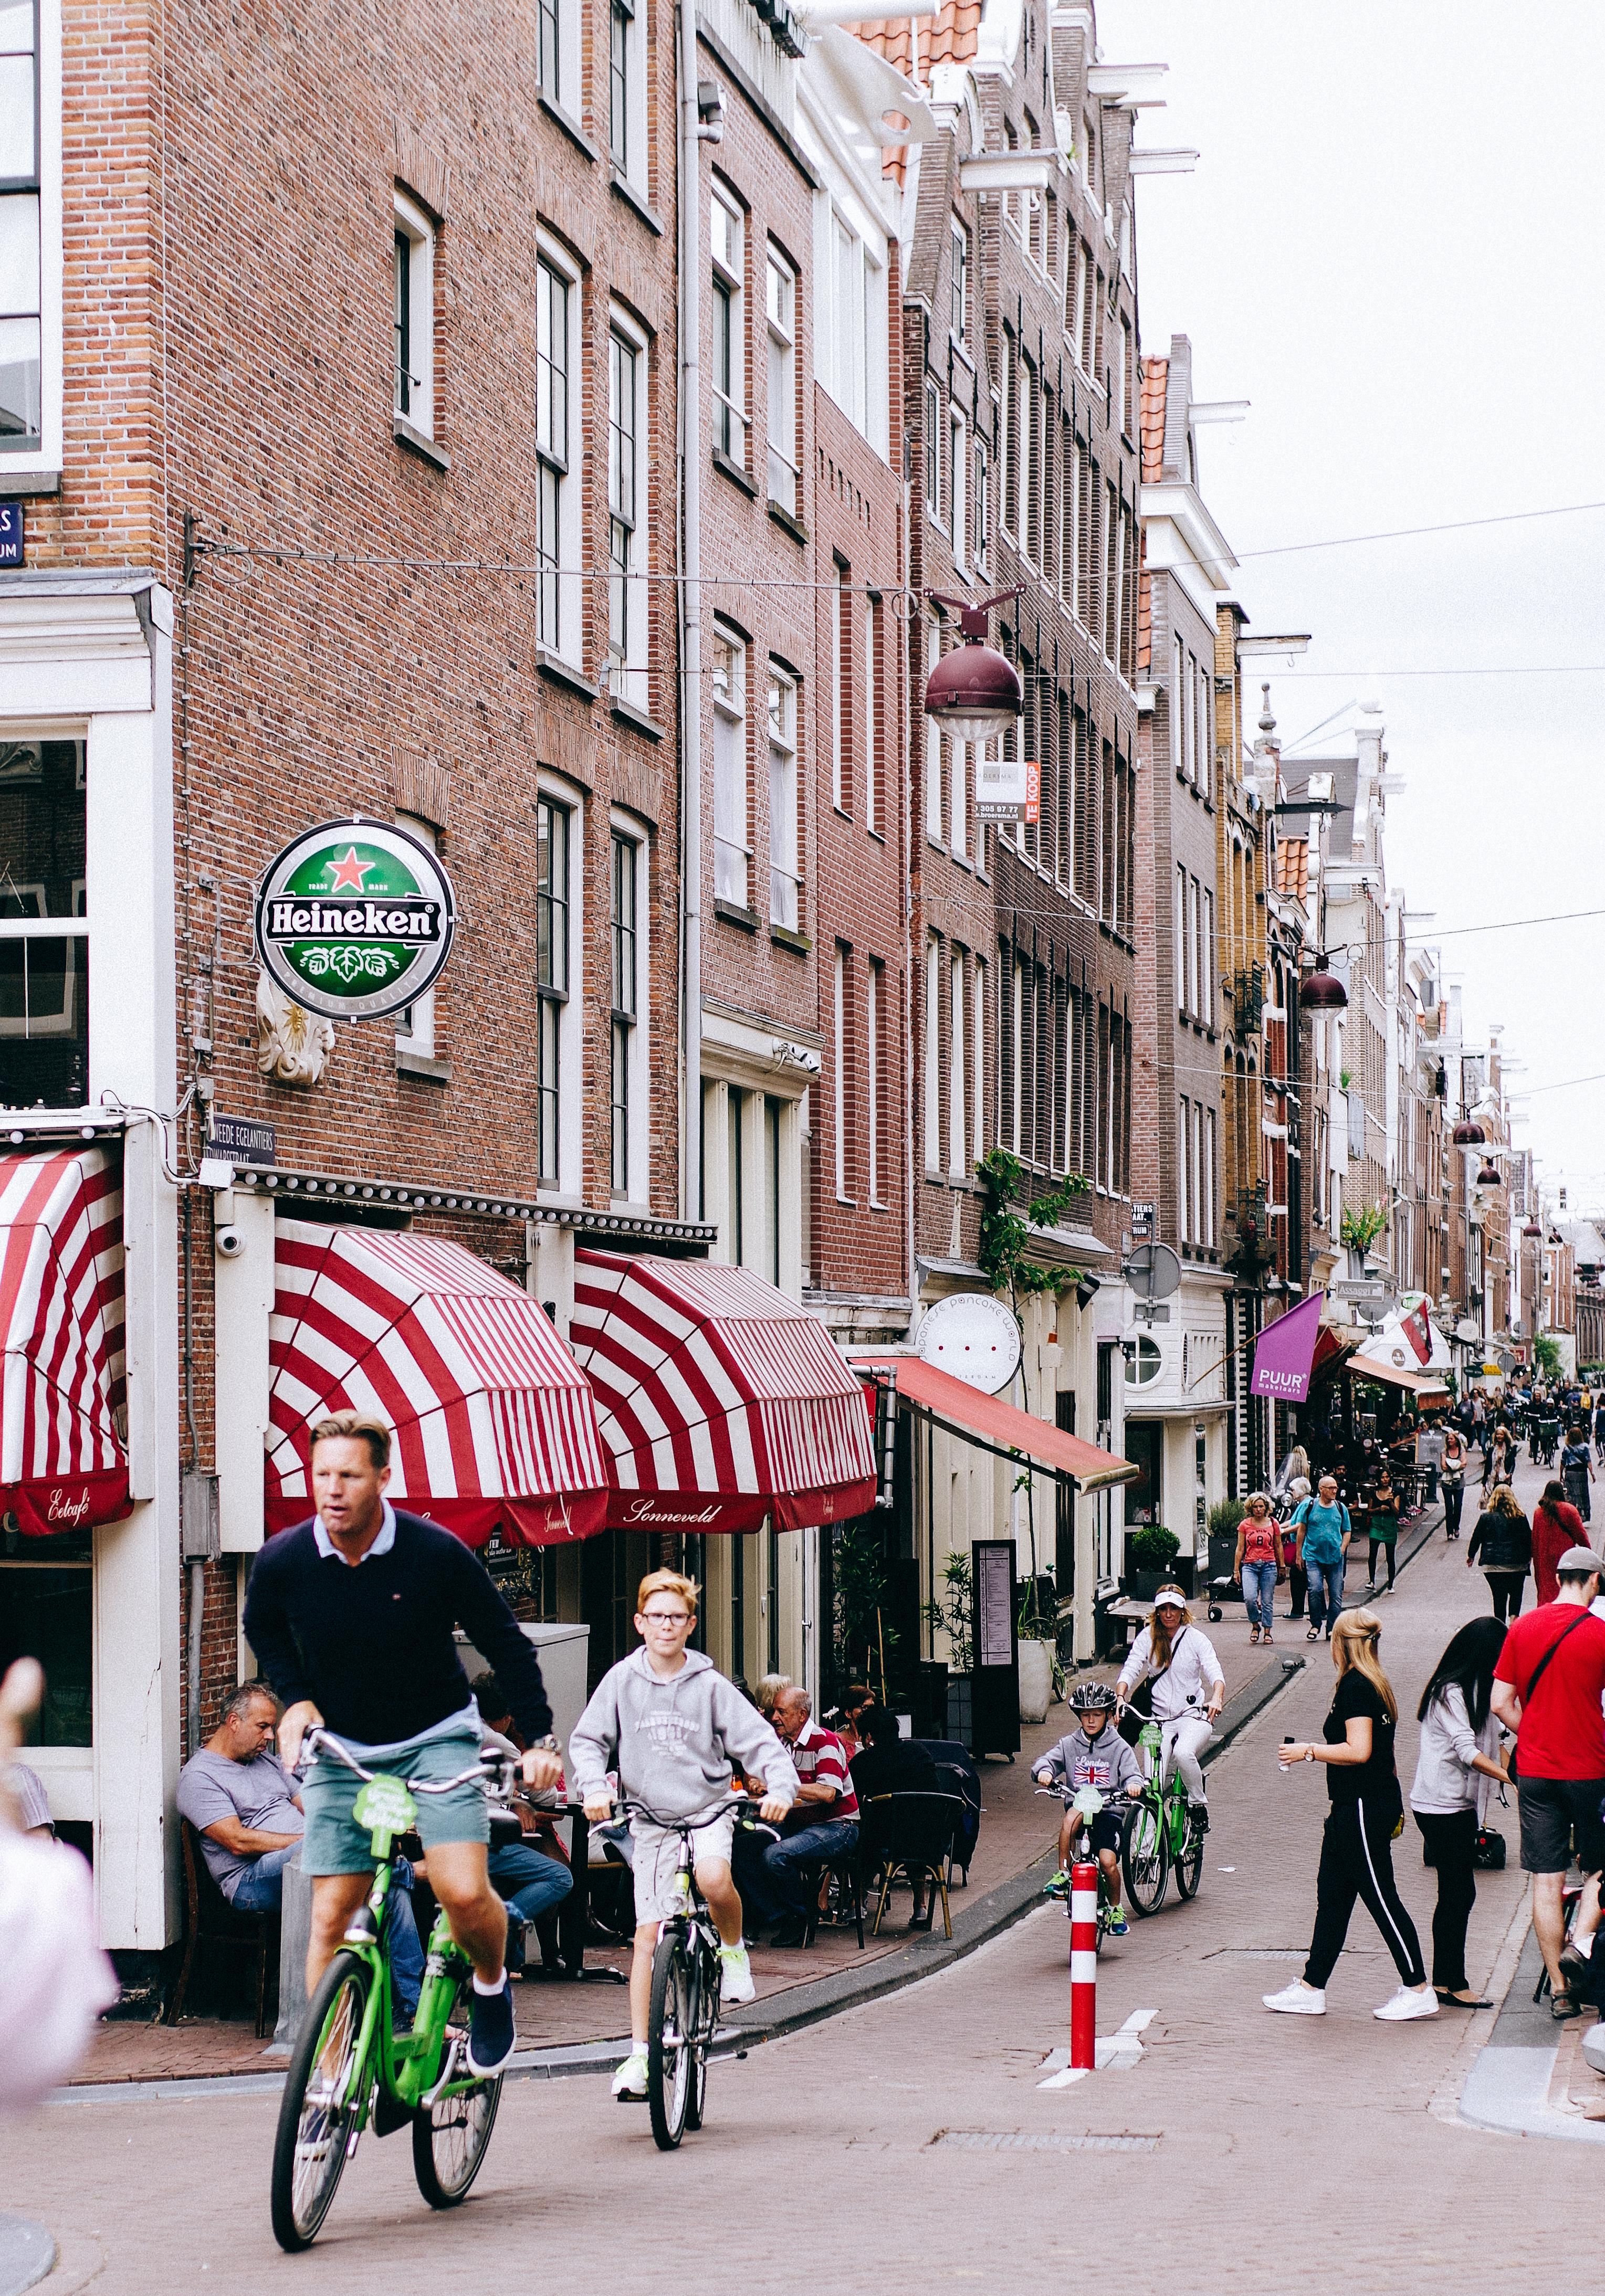 2016 JUL Amsterdam Jordaan-10